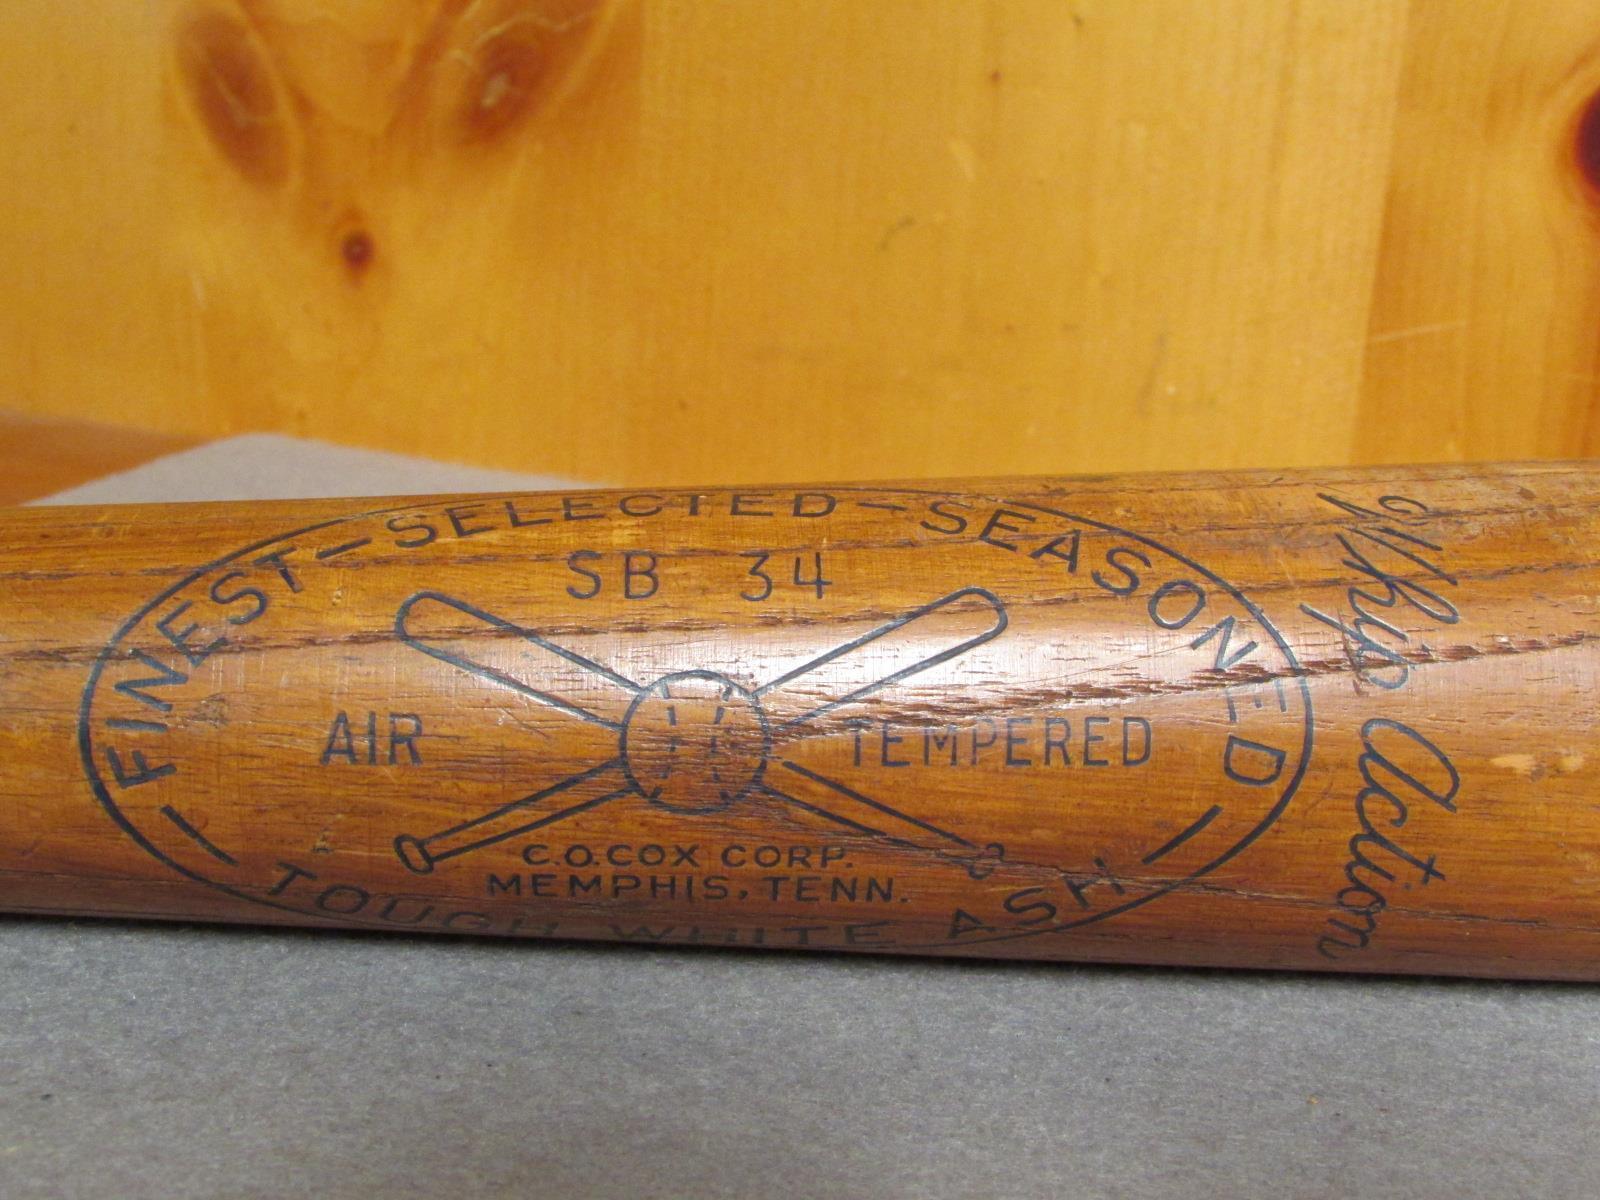 Vintage C. O. O. O. Cox Corp. Früh Holz Baseball Schläger SB34 Peitsche Aktion d35327